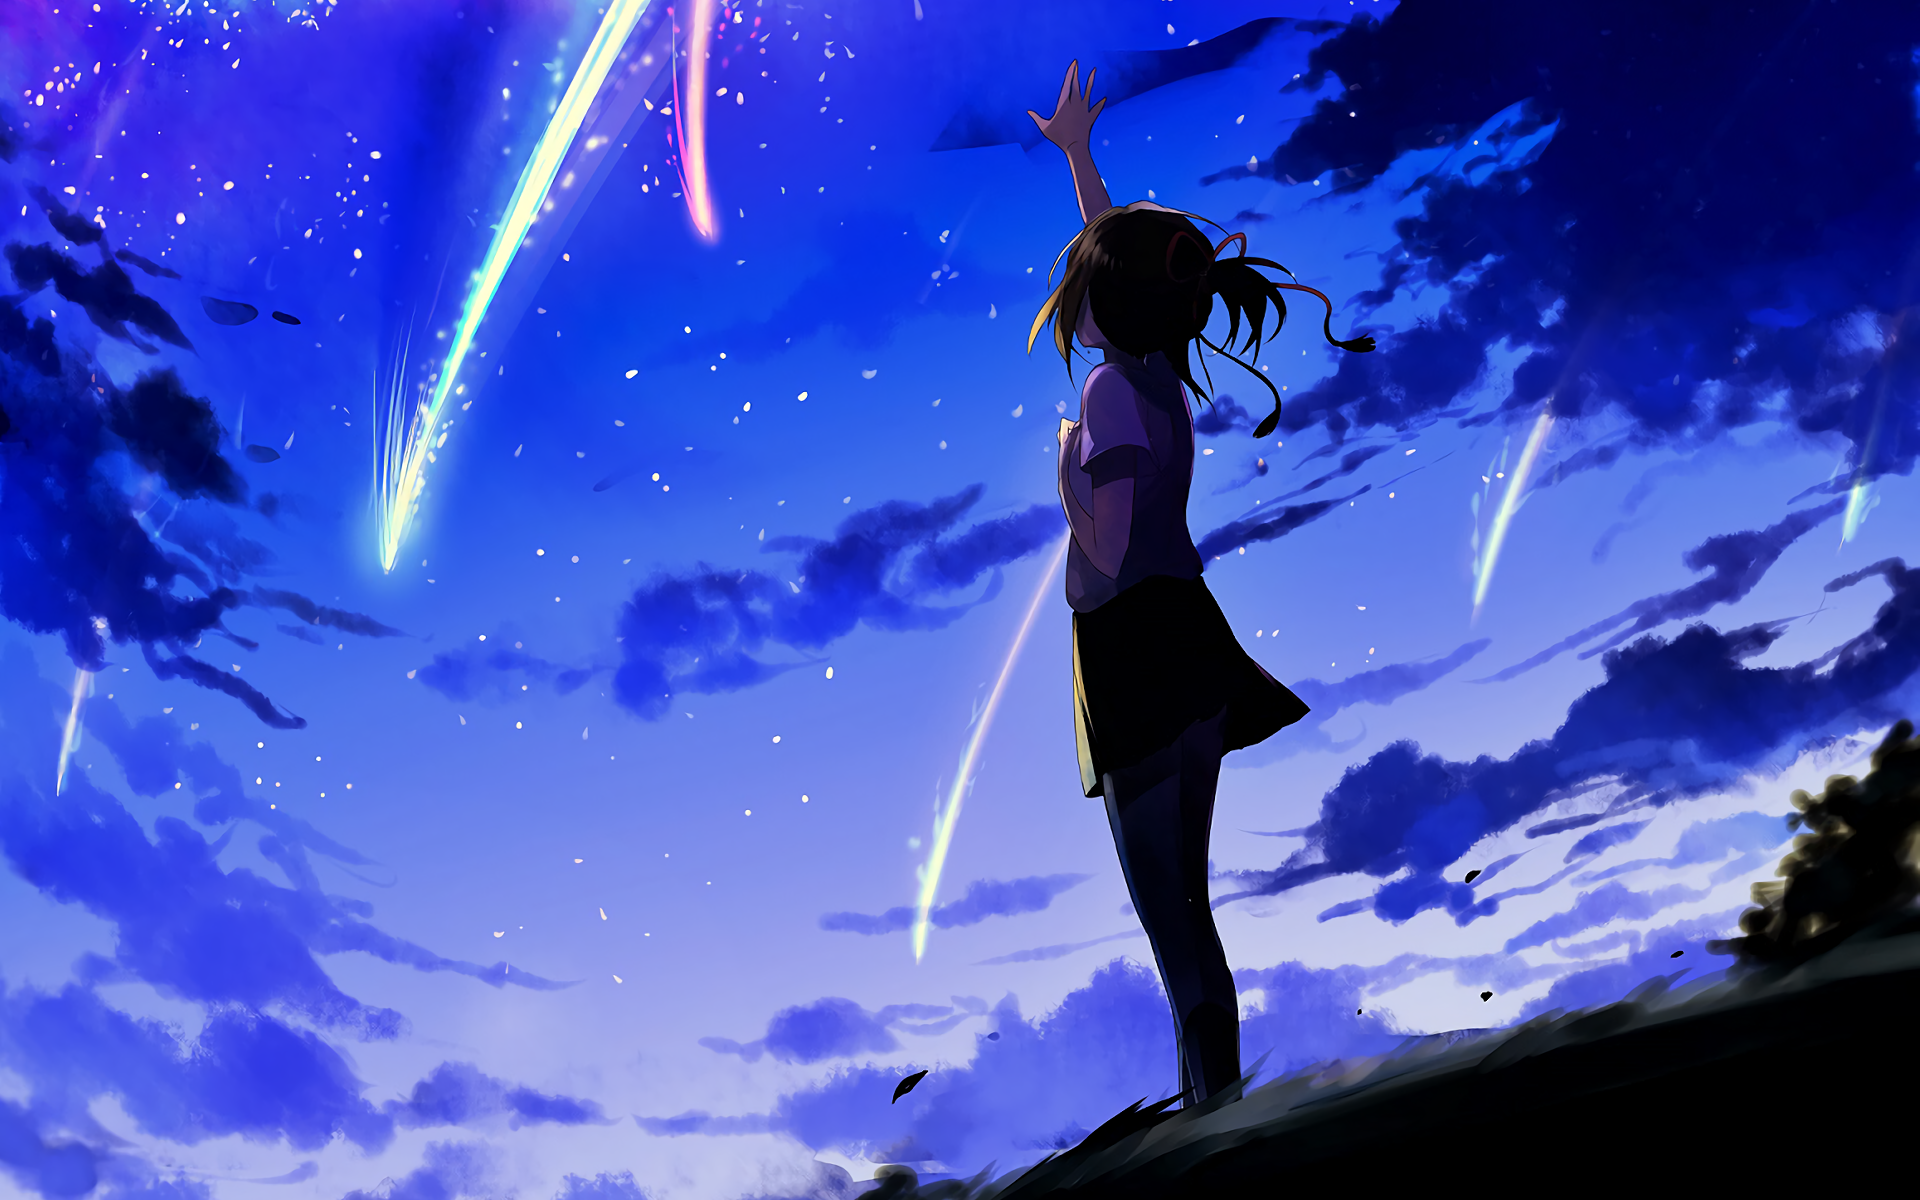 Anime Hd Kimi No Na Wa Wallpapers Wallpaper Cave